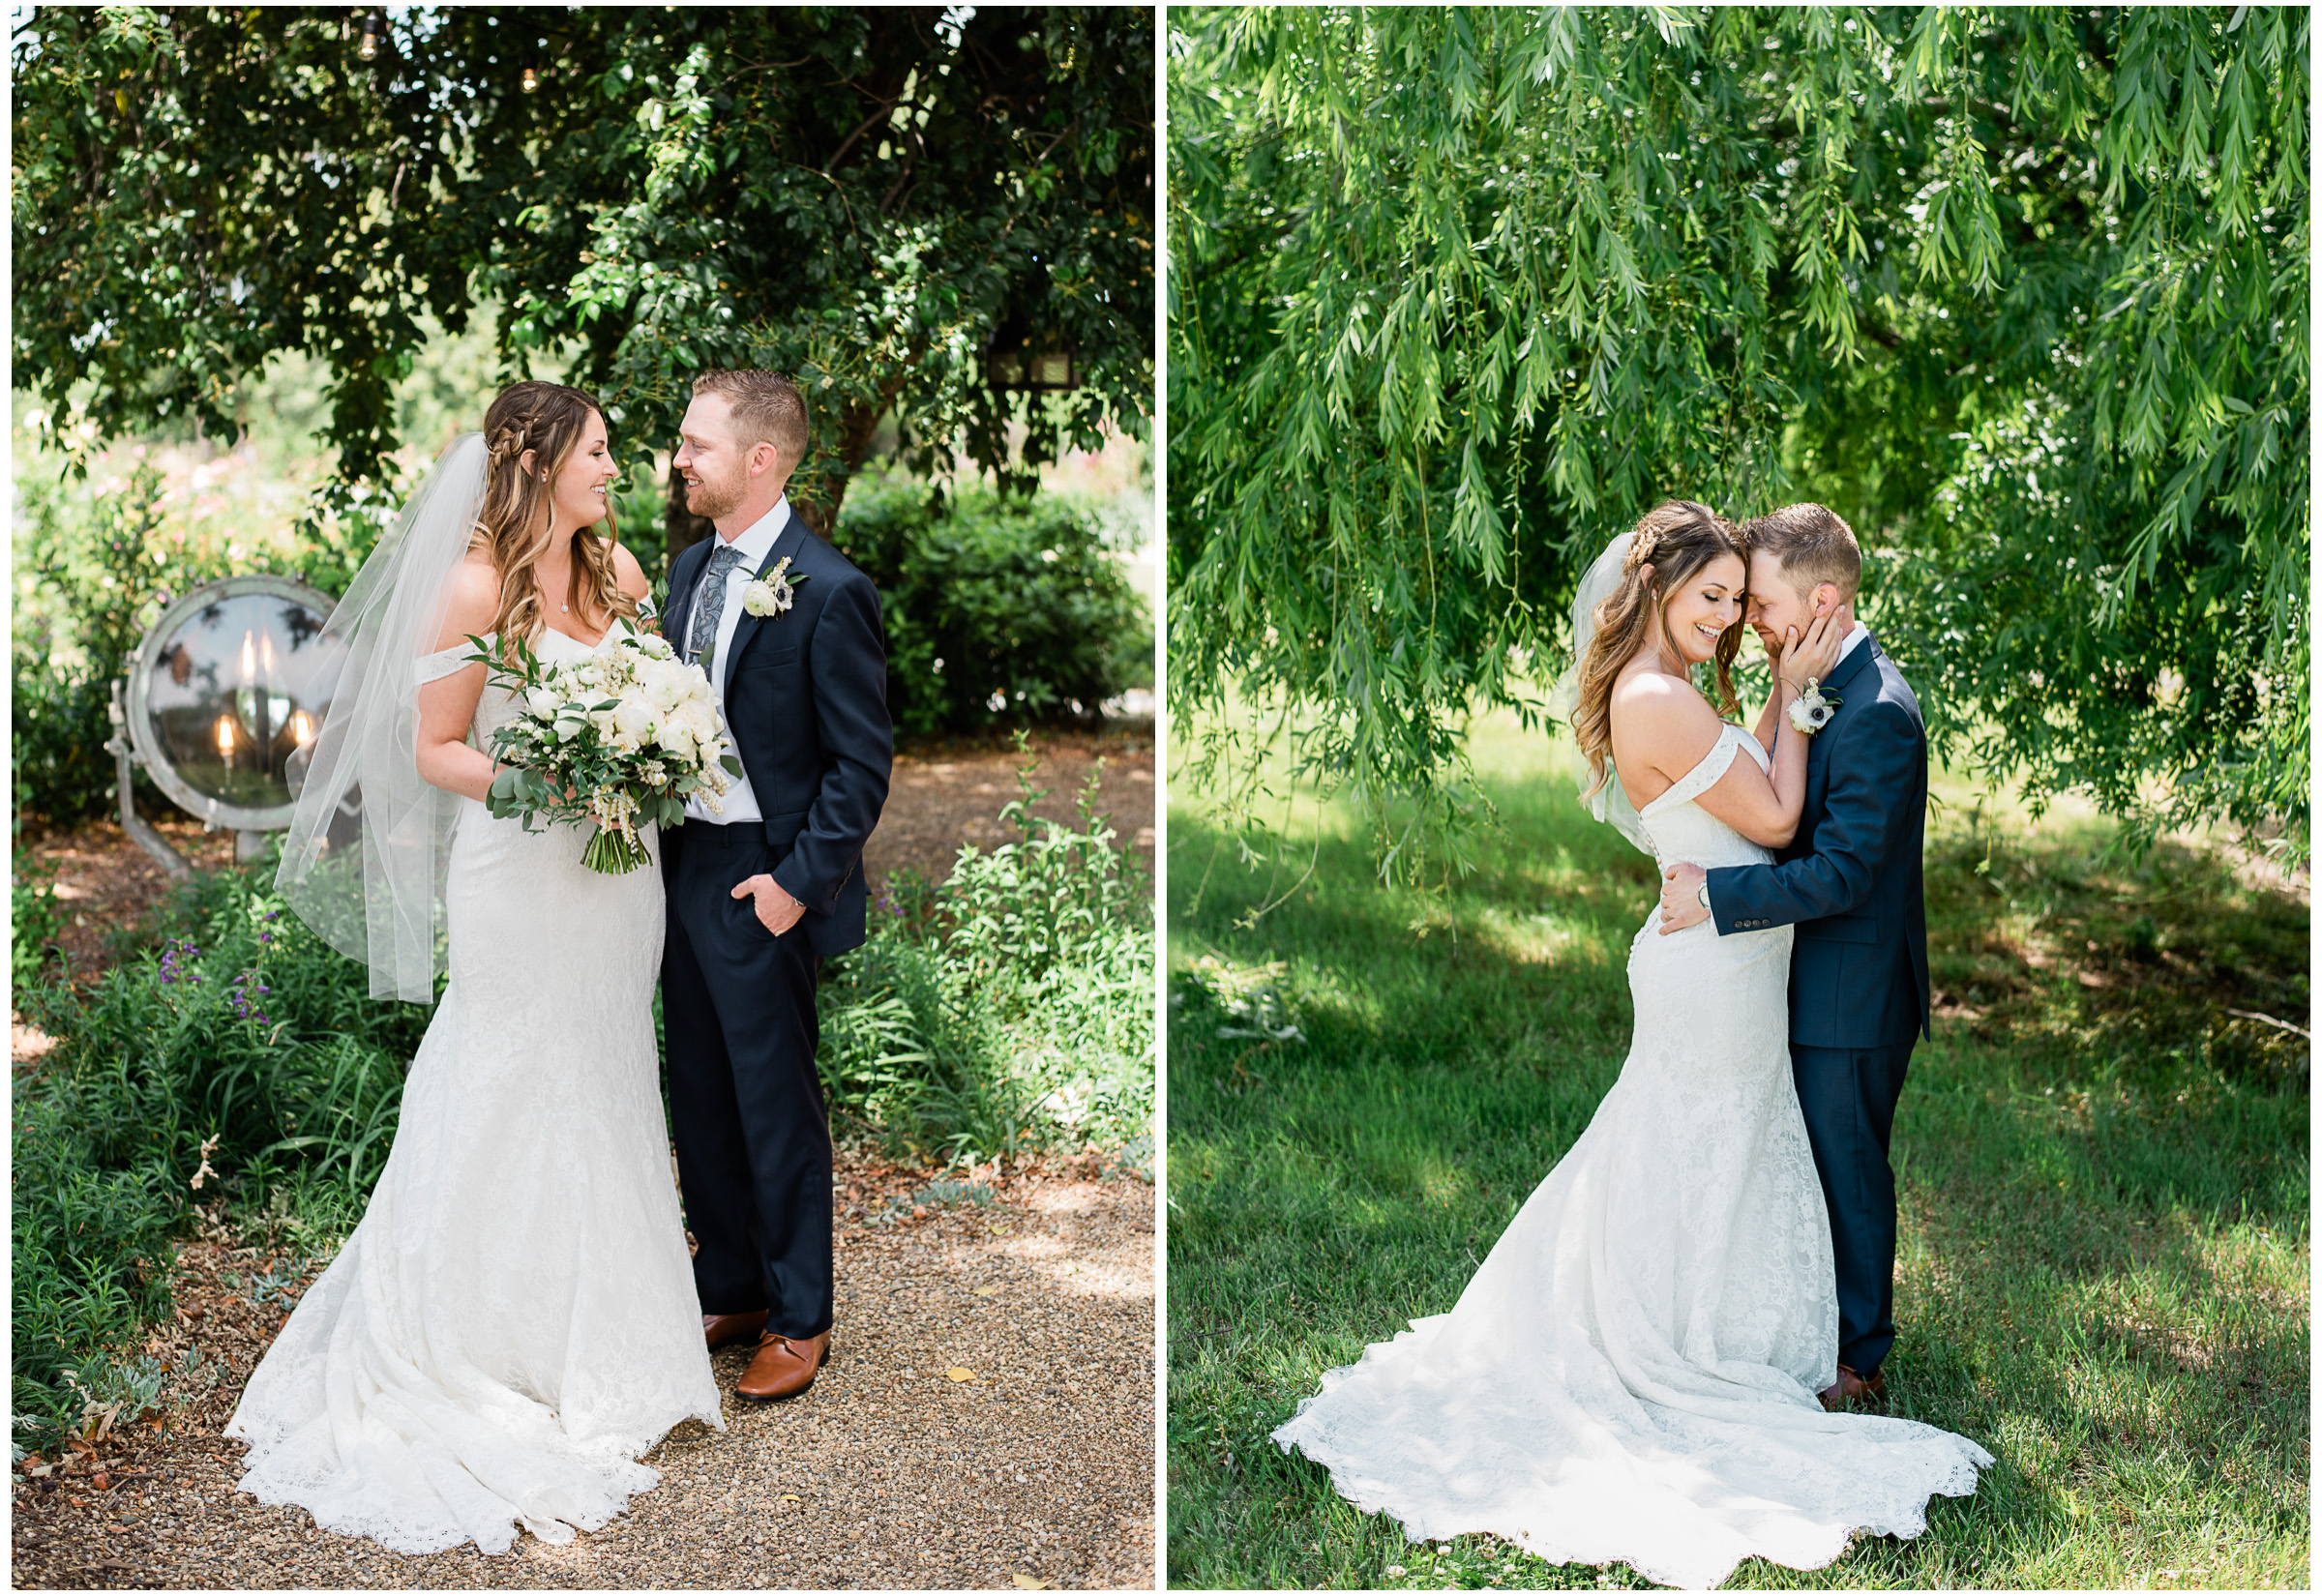 Winters Wedding - Sacramento Photographer - Field & Pond - Justin Wilcox Photography - 12.jpg